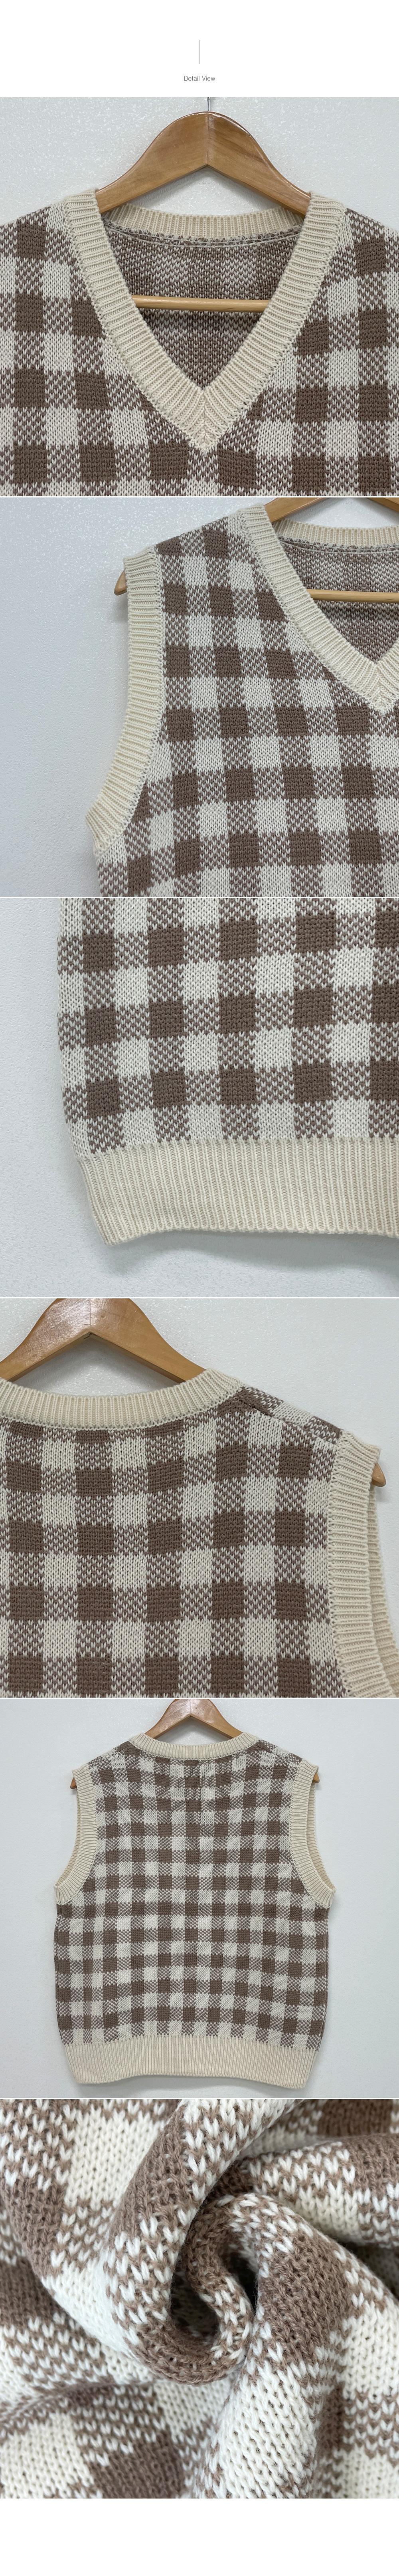 Go, Check V-Neck Knitwear Best Vest